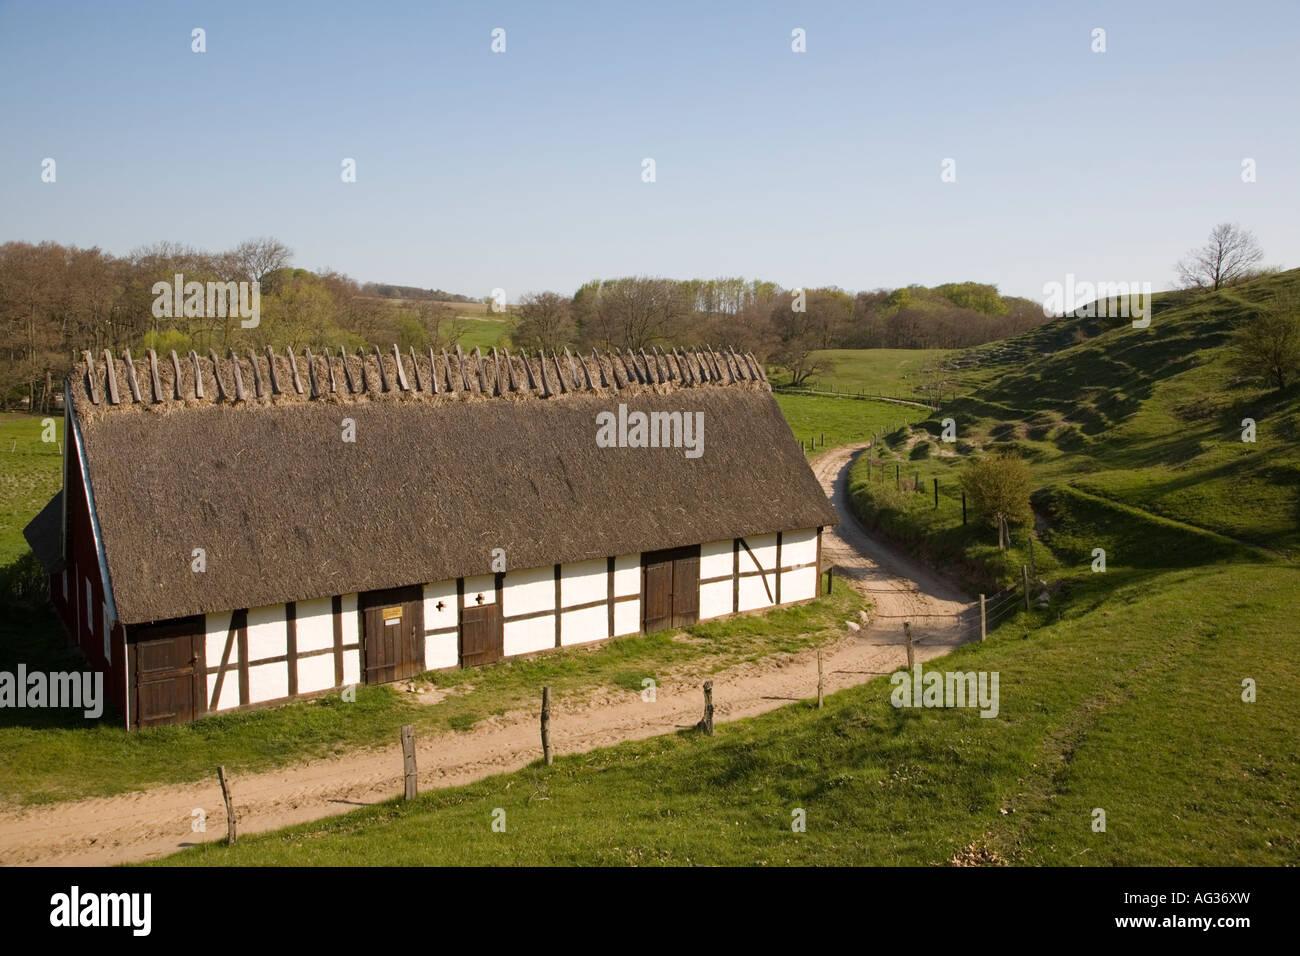 Sweden Skane farmhouse barn Havang iconic buildings Lindgrens Langa in spring May 2006 - Stock Image